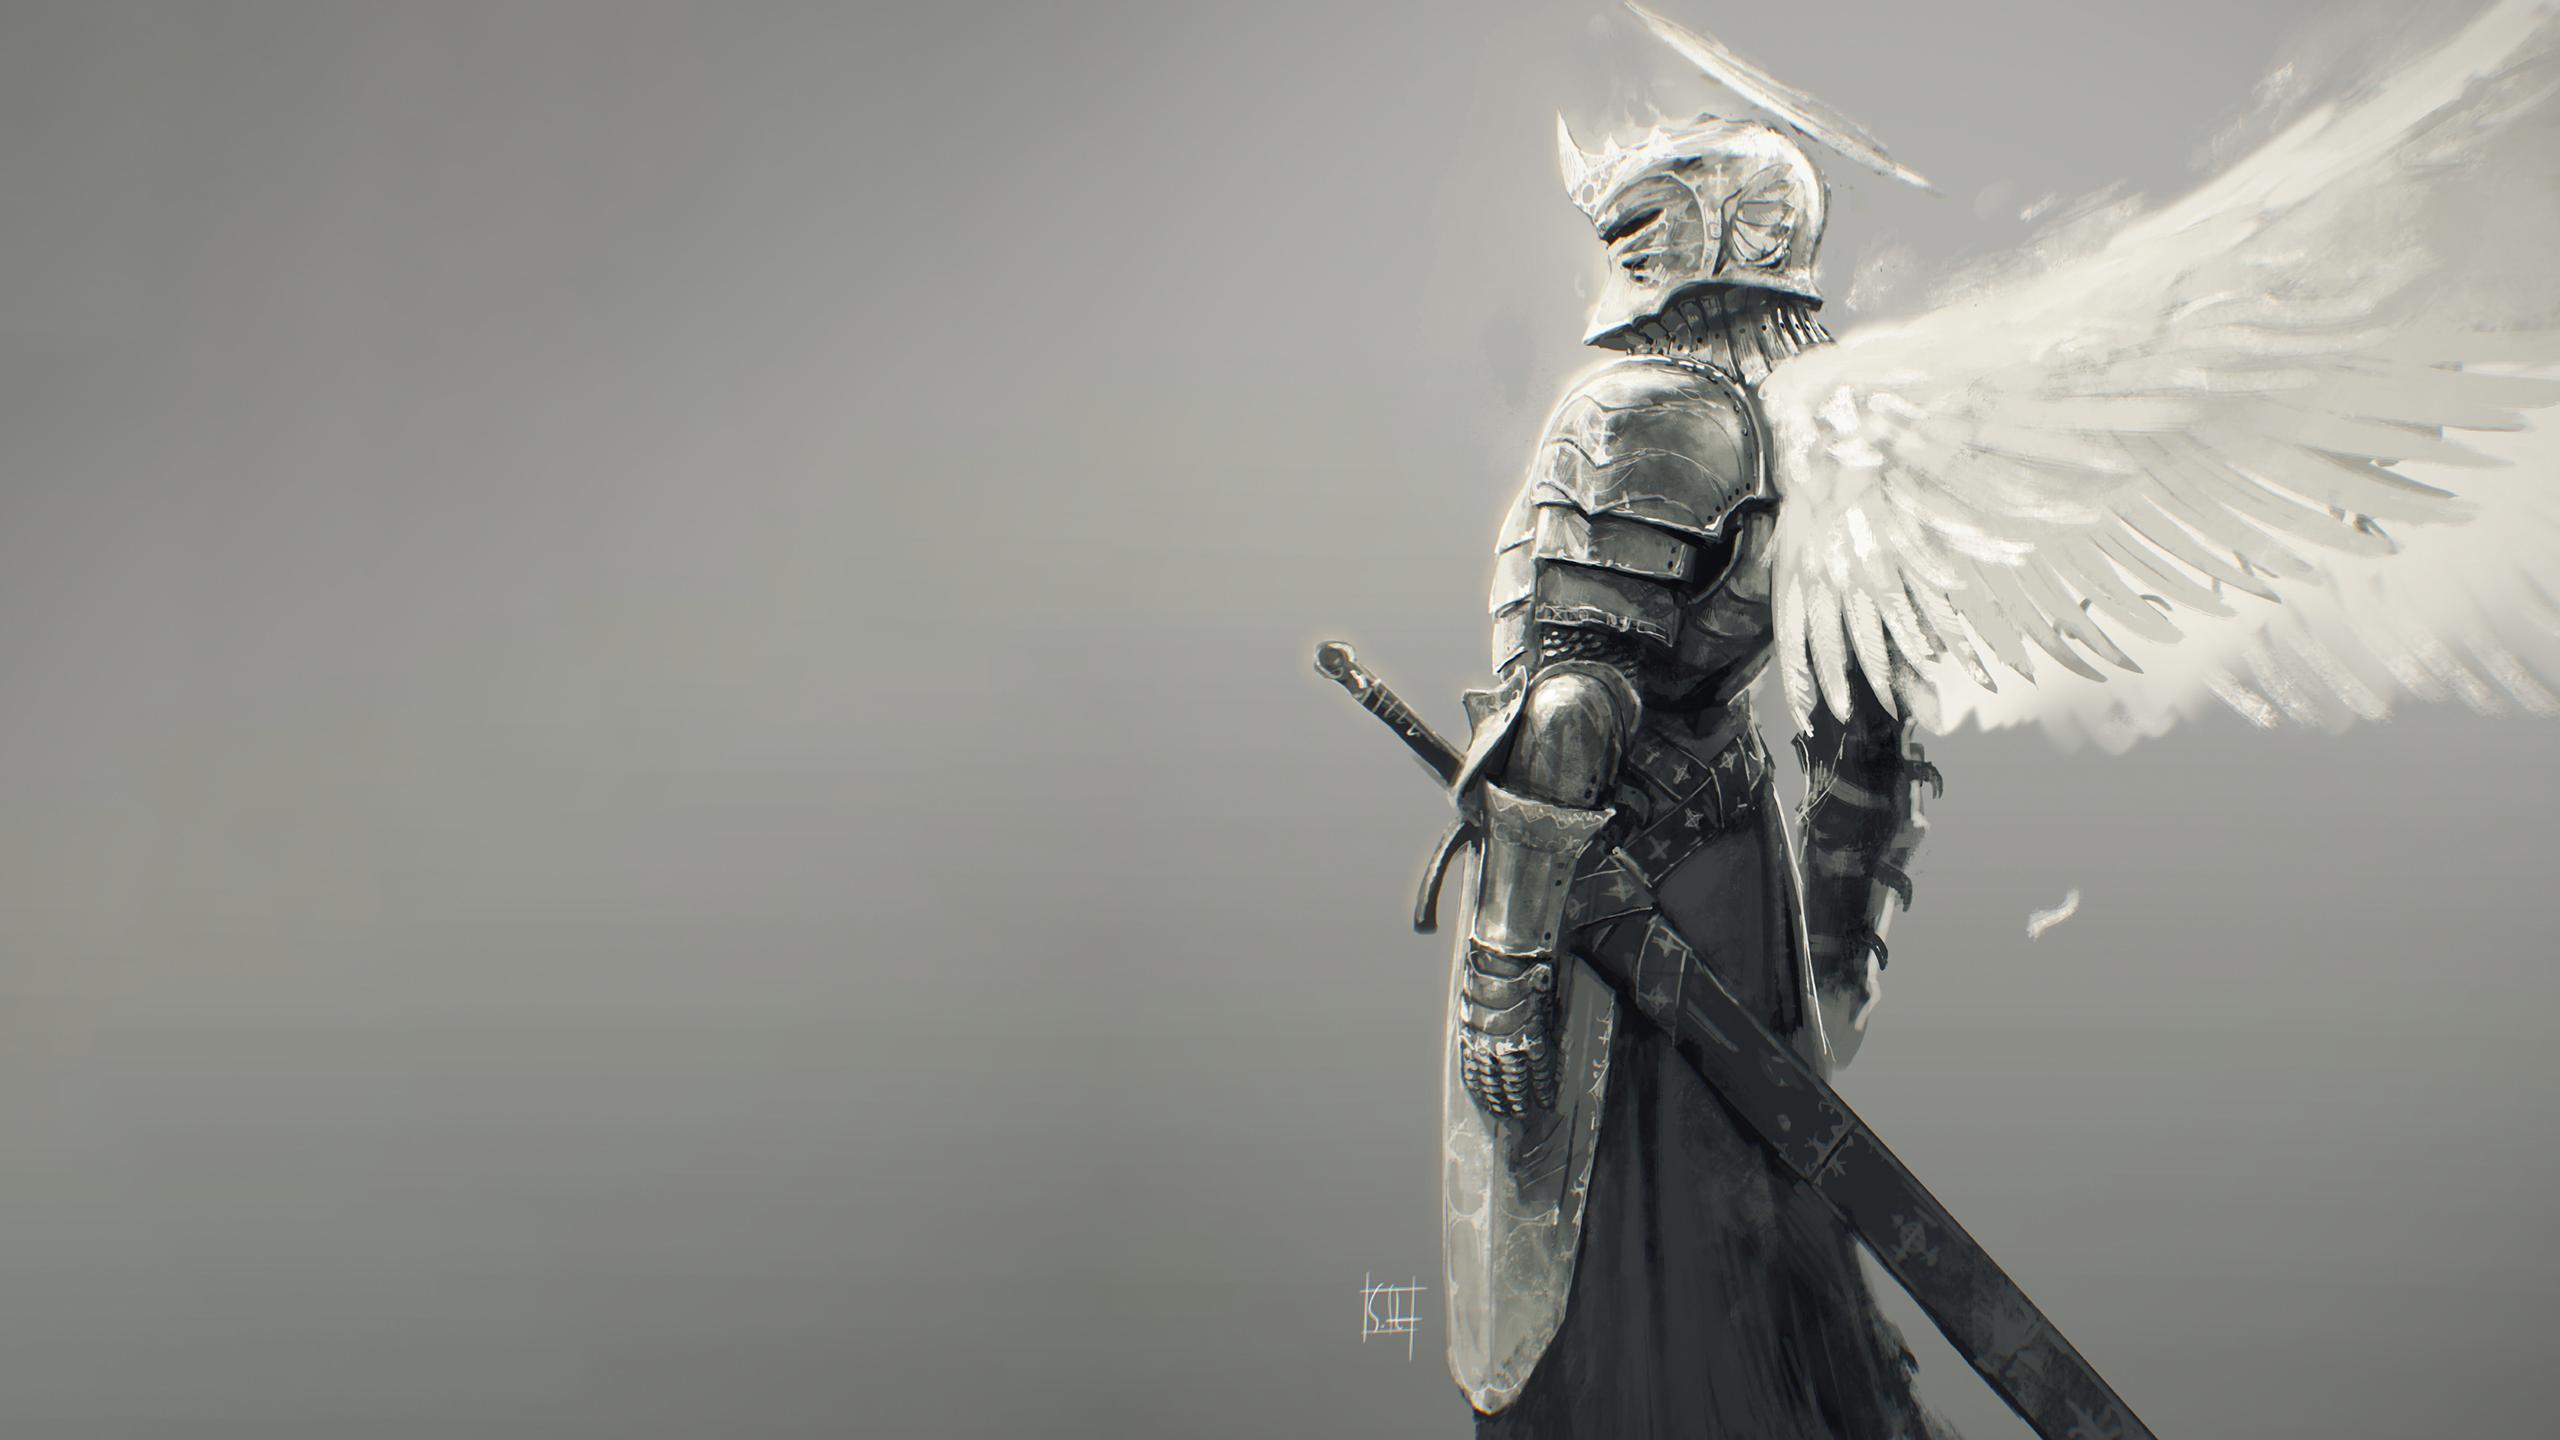 wallpaper drawing monochrome fantasy art knight